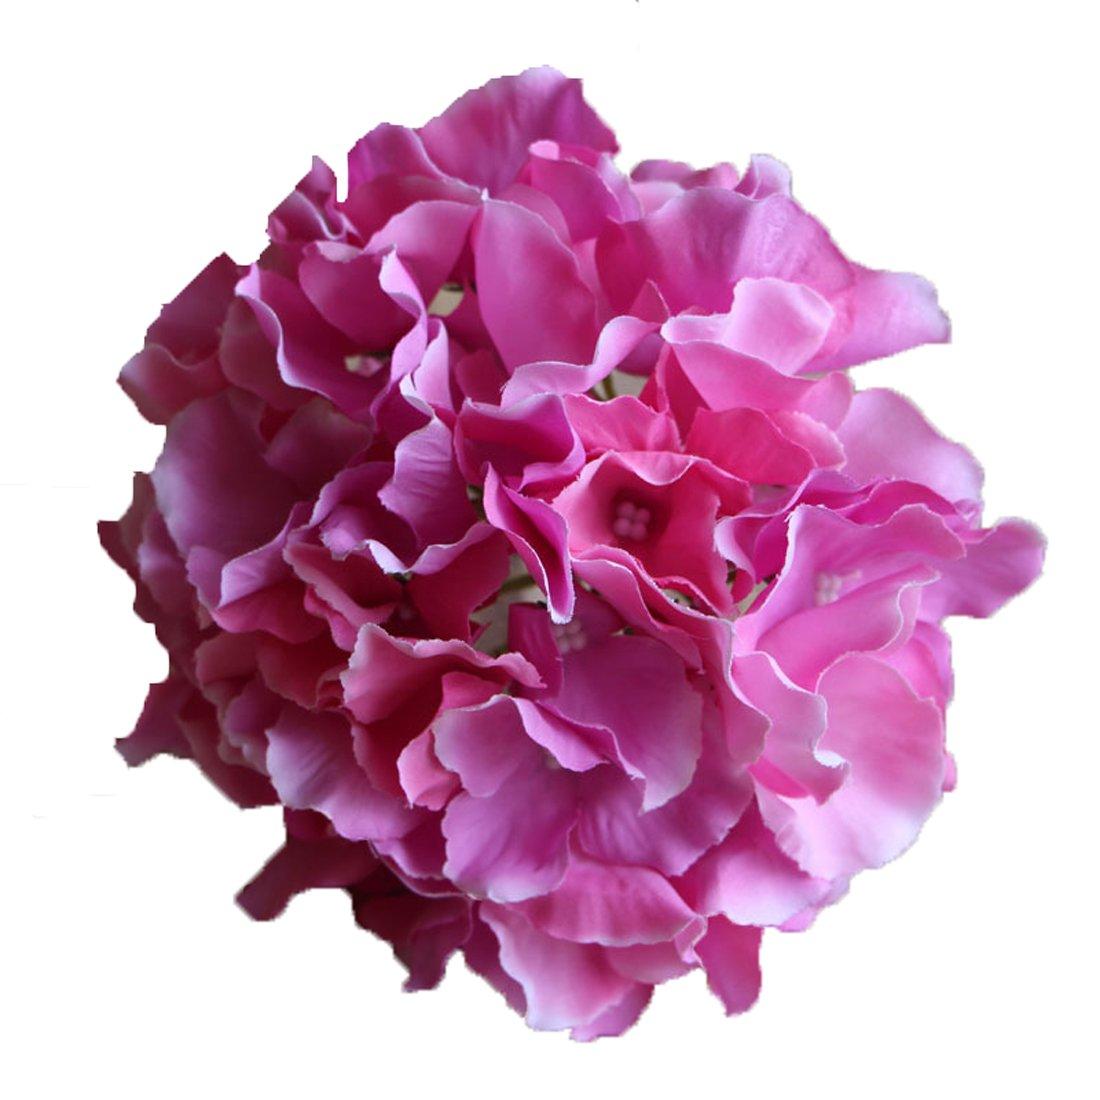 Calcifer 10 Pcs Mallorca Hydrangea Flowers Artificial Flowers for Home Garden Wedding Bohemia Hat Decor Blue